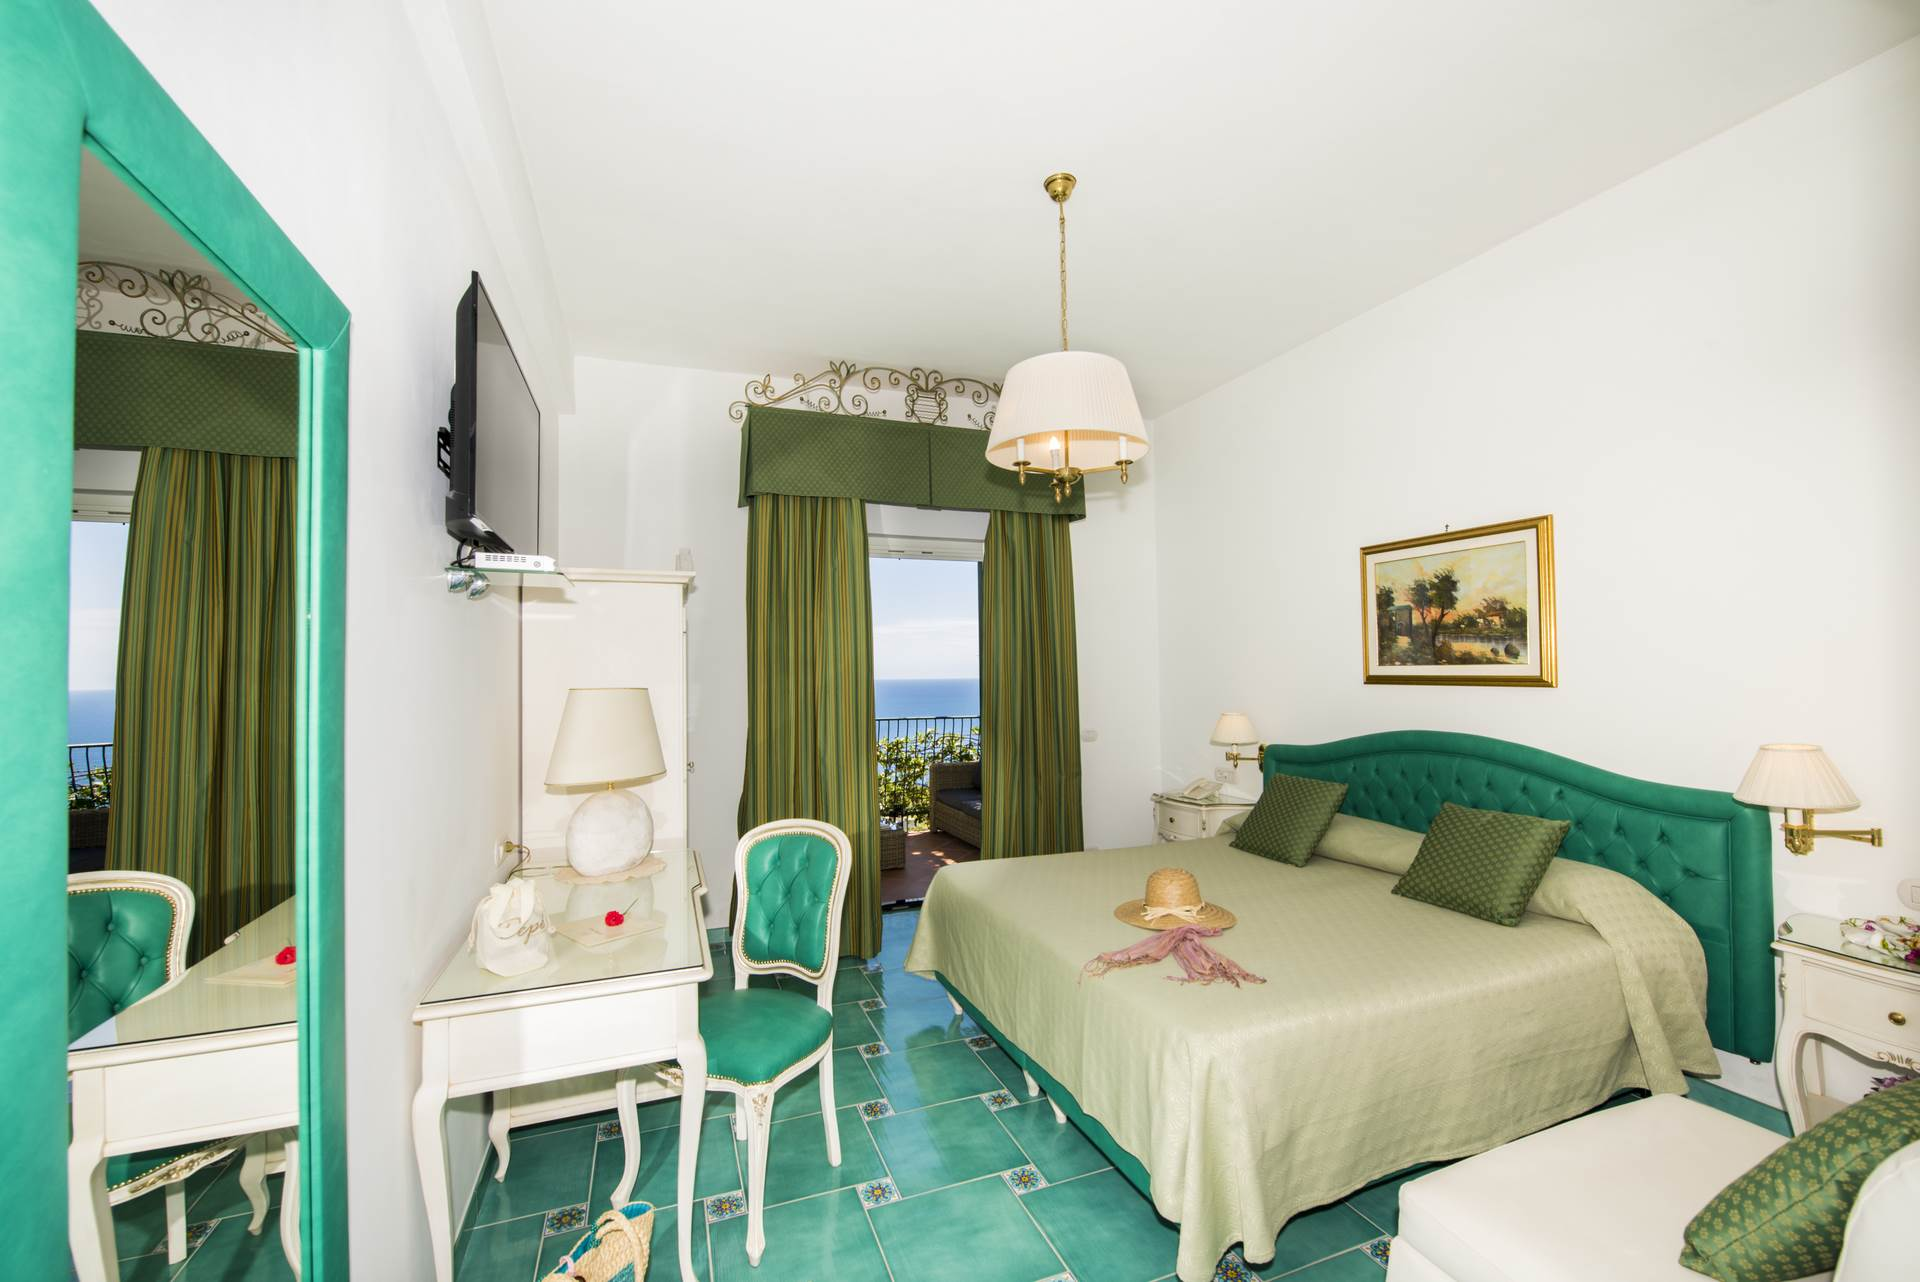 hotel_pellegrino_praiano_39_1920